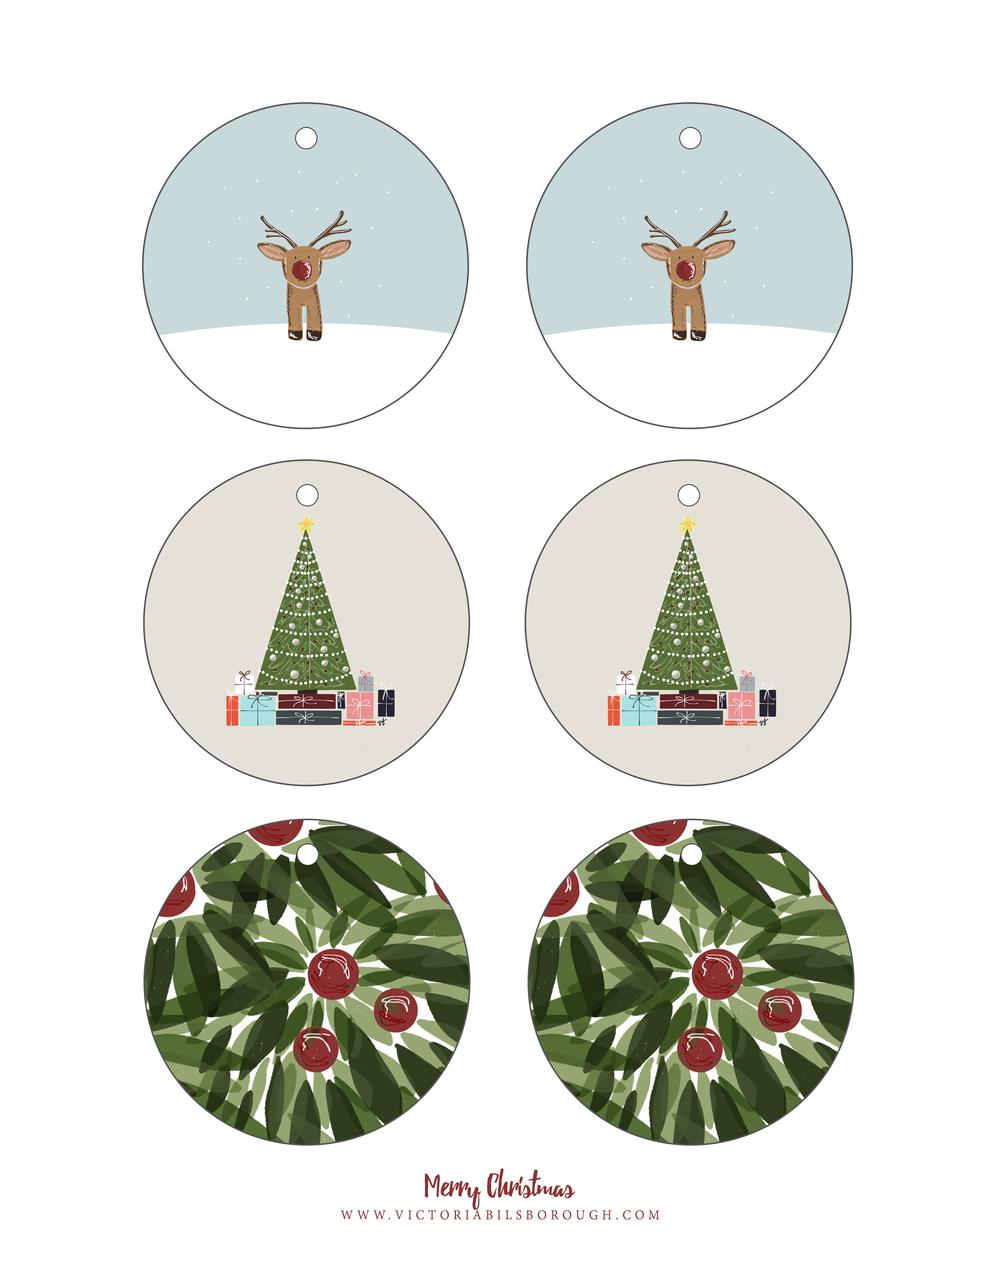 Christmas Printable Gift Tags - www.victoriabilsborough.com